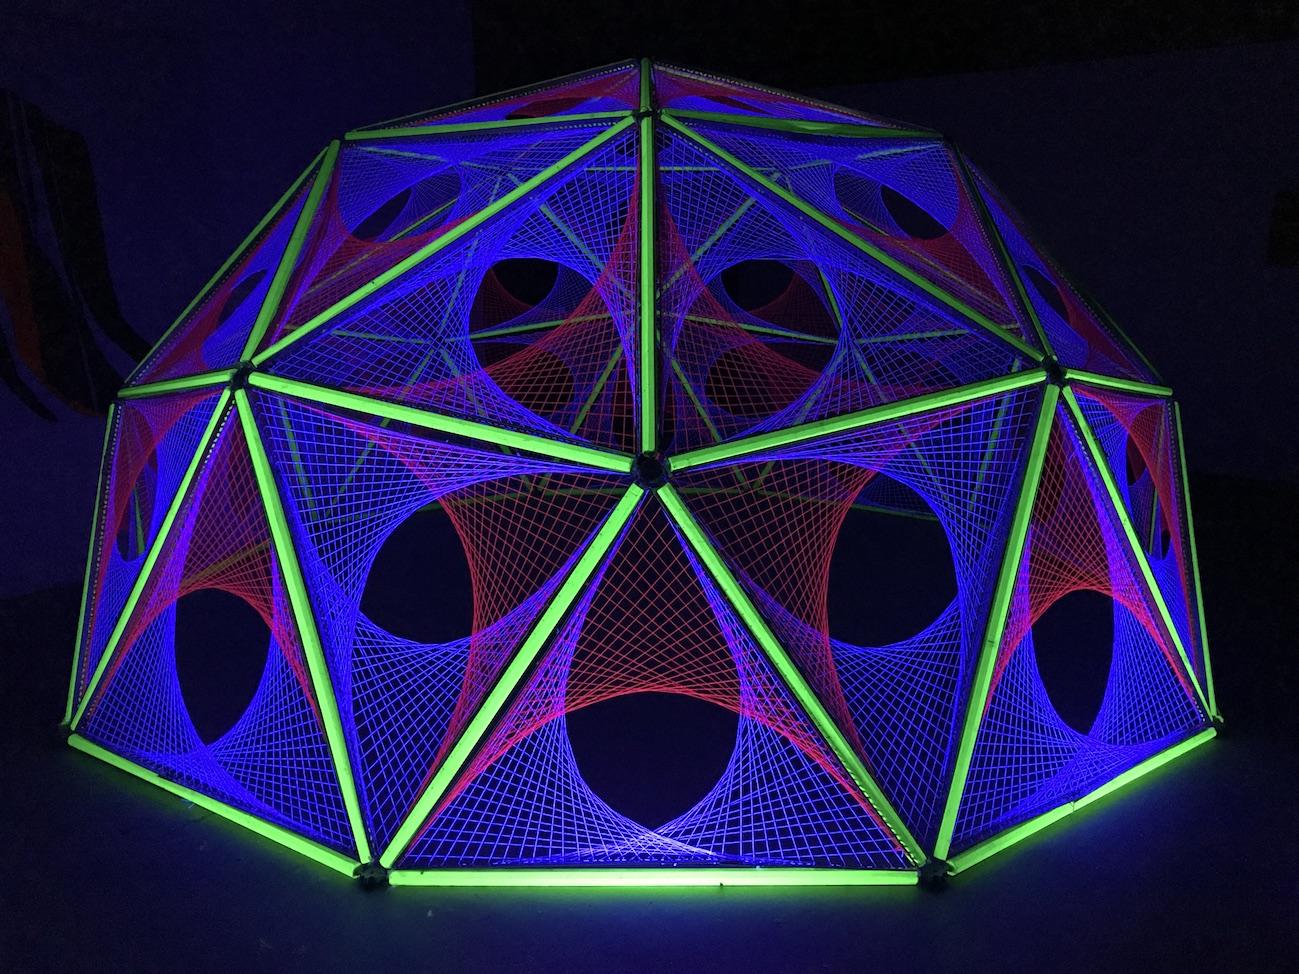 2-spectra-light-art-ultra-violet-black-aberdeen-dome-hub-geodesic-parabola.jpg